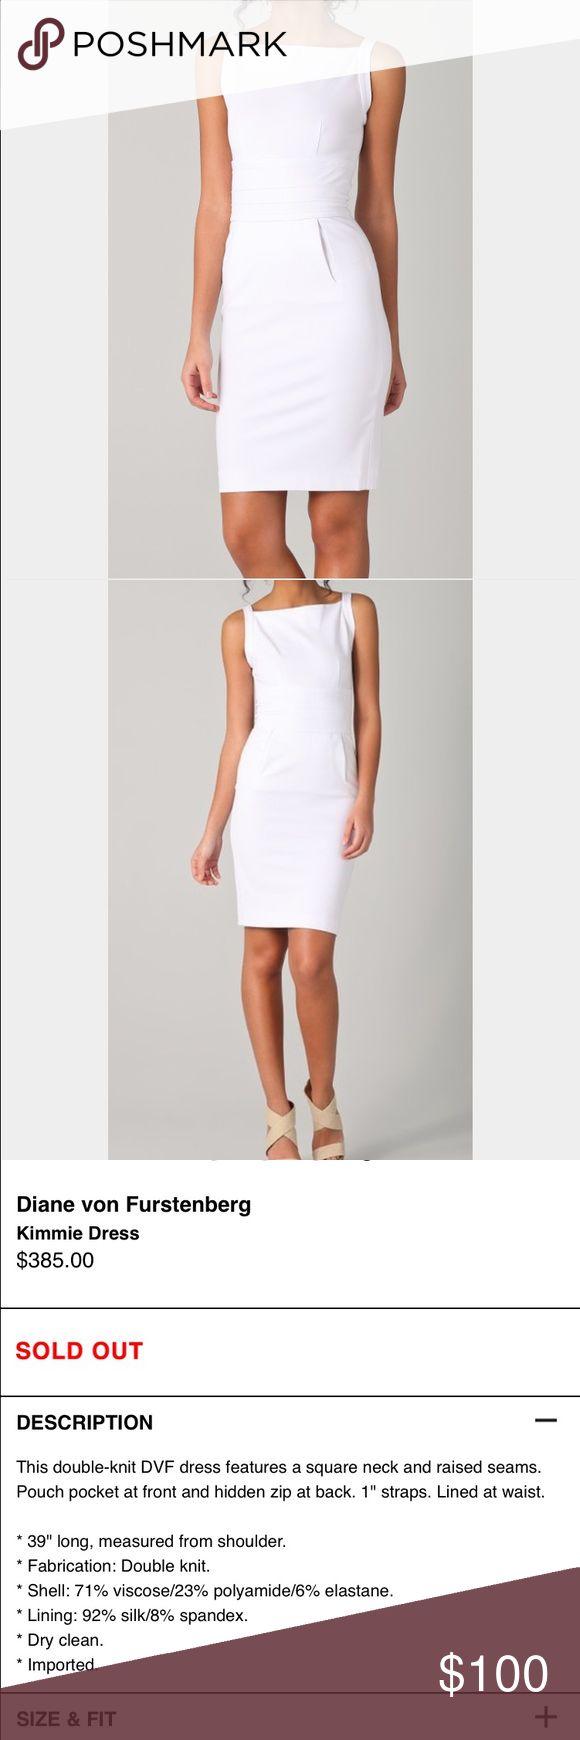 NWT Diane von Furstenberg Kimmie White Dress Sold out everywhere! New with tags for $348! Diane von Furstenberg Dresses